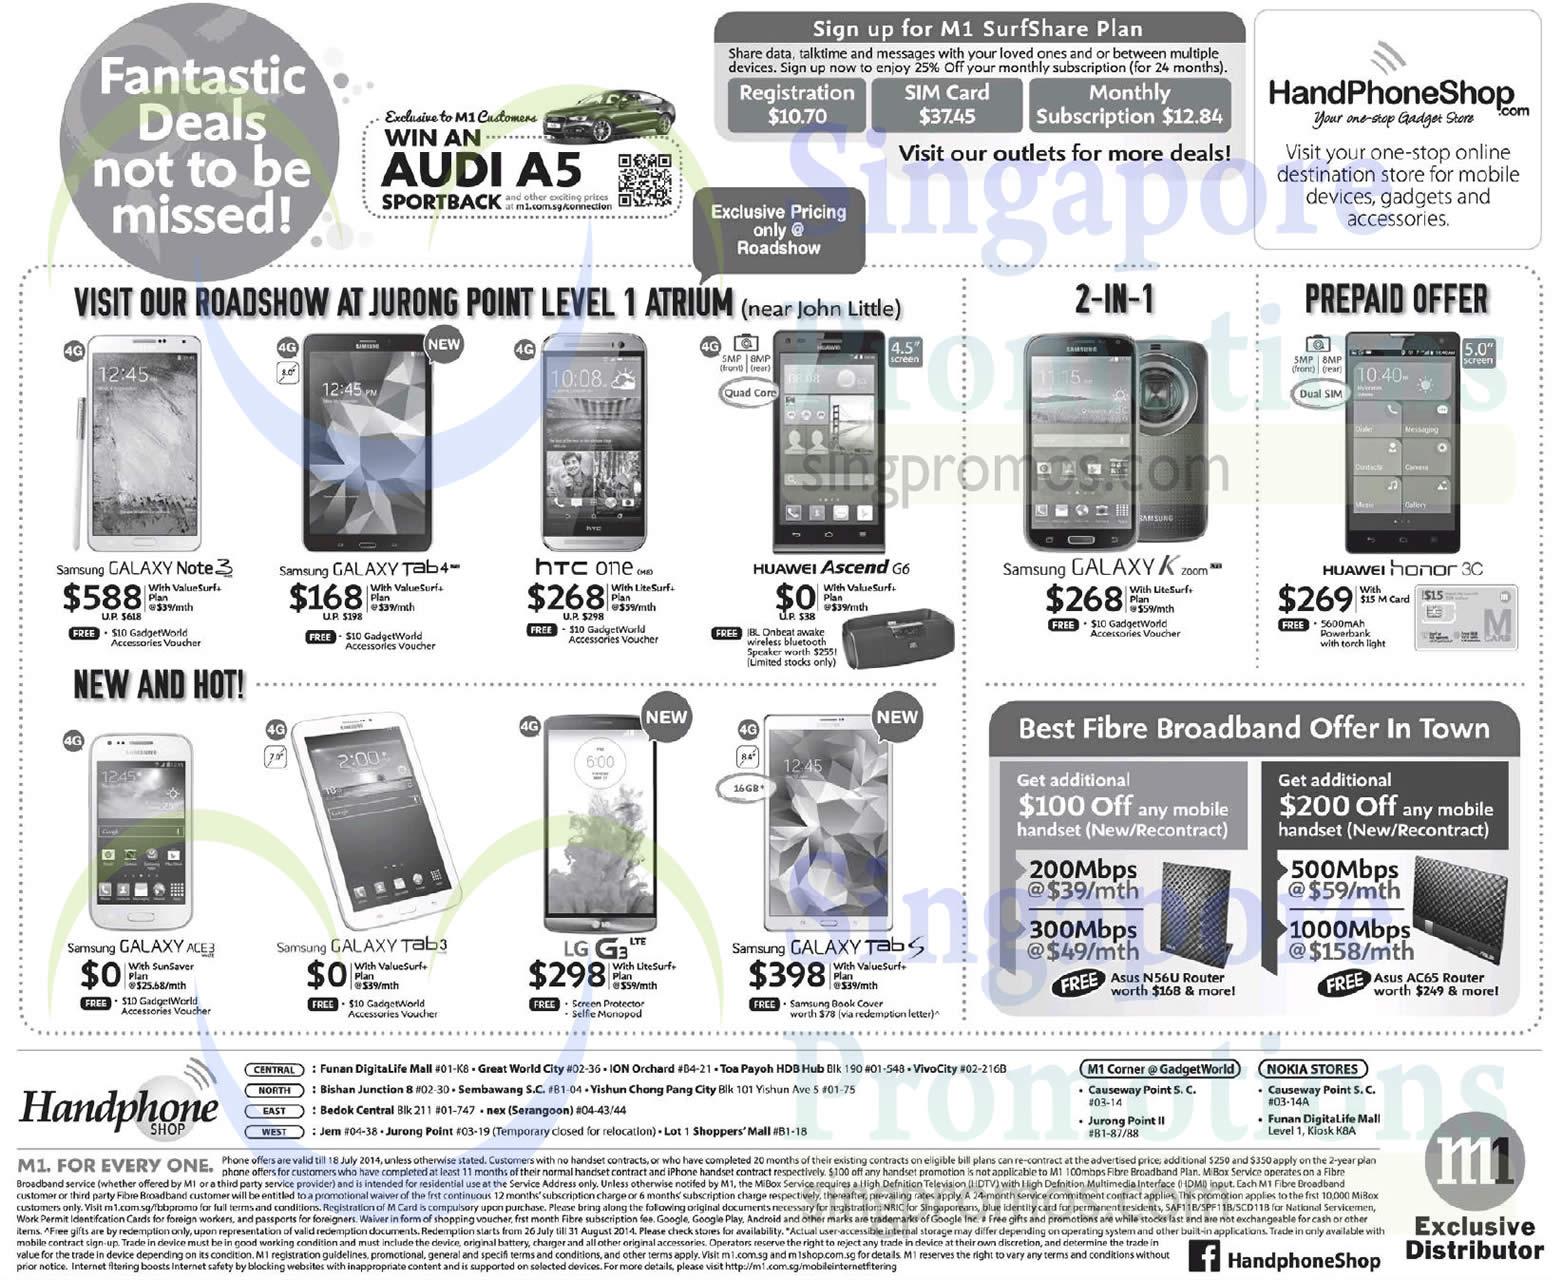 Handphone Shop Roadshow Samsung Galaxy Note 3 Tab 4